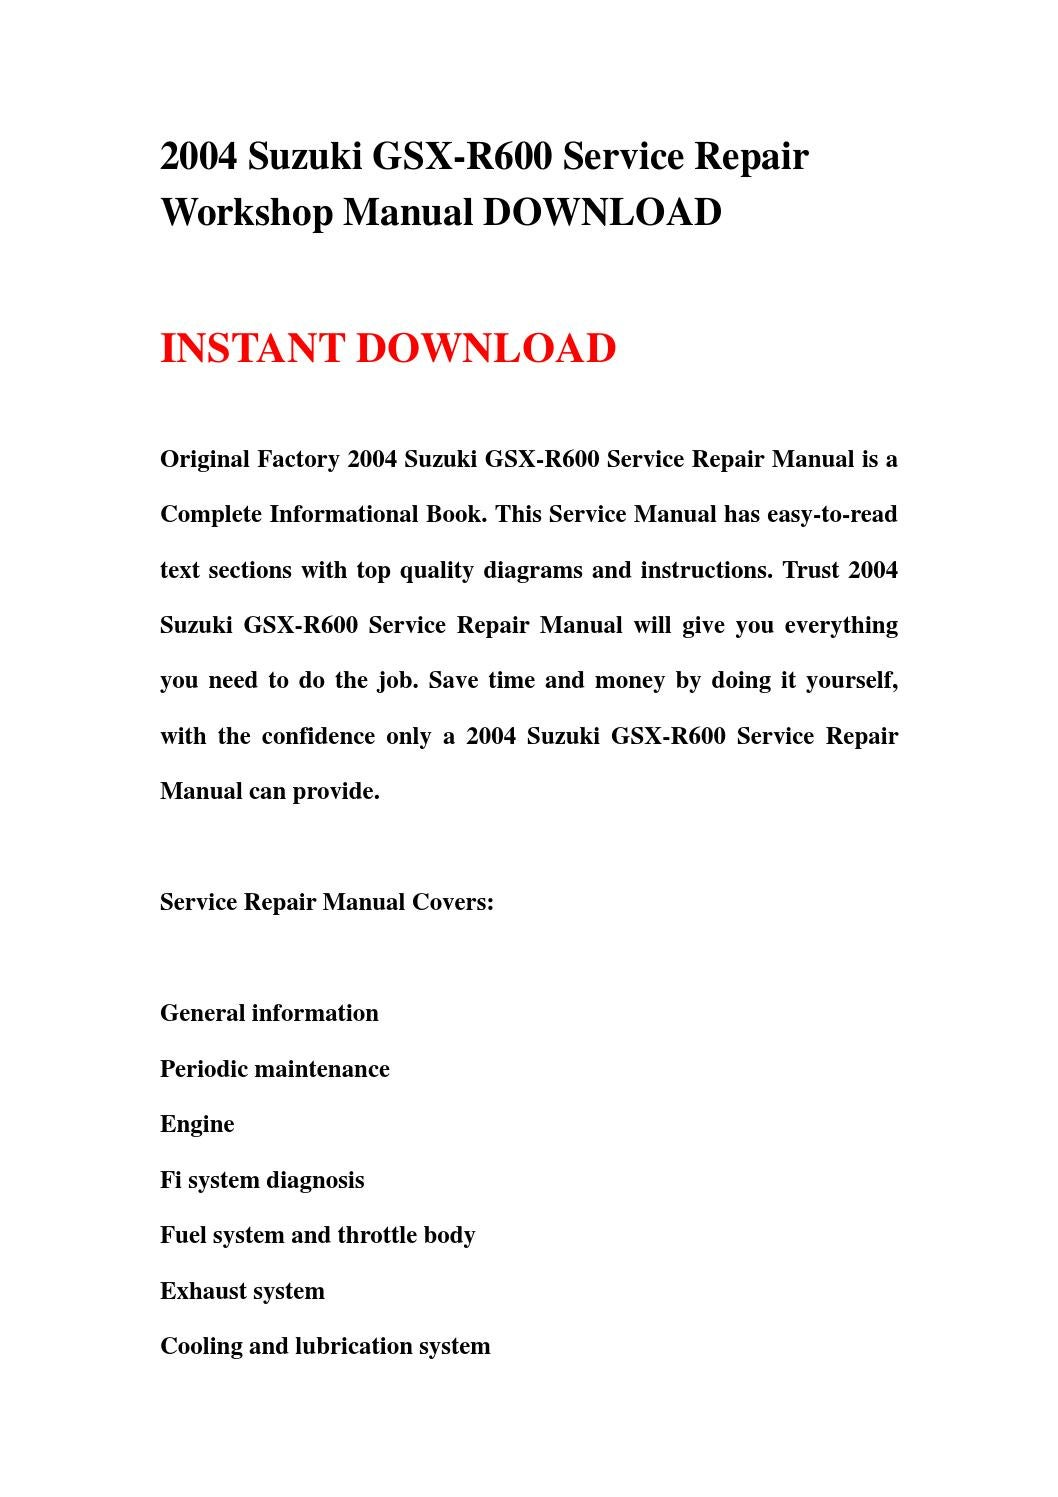 2004 suzuki gsx r600 service repair workshop manual download by jjfhsbebf -  issuu